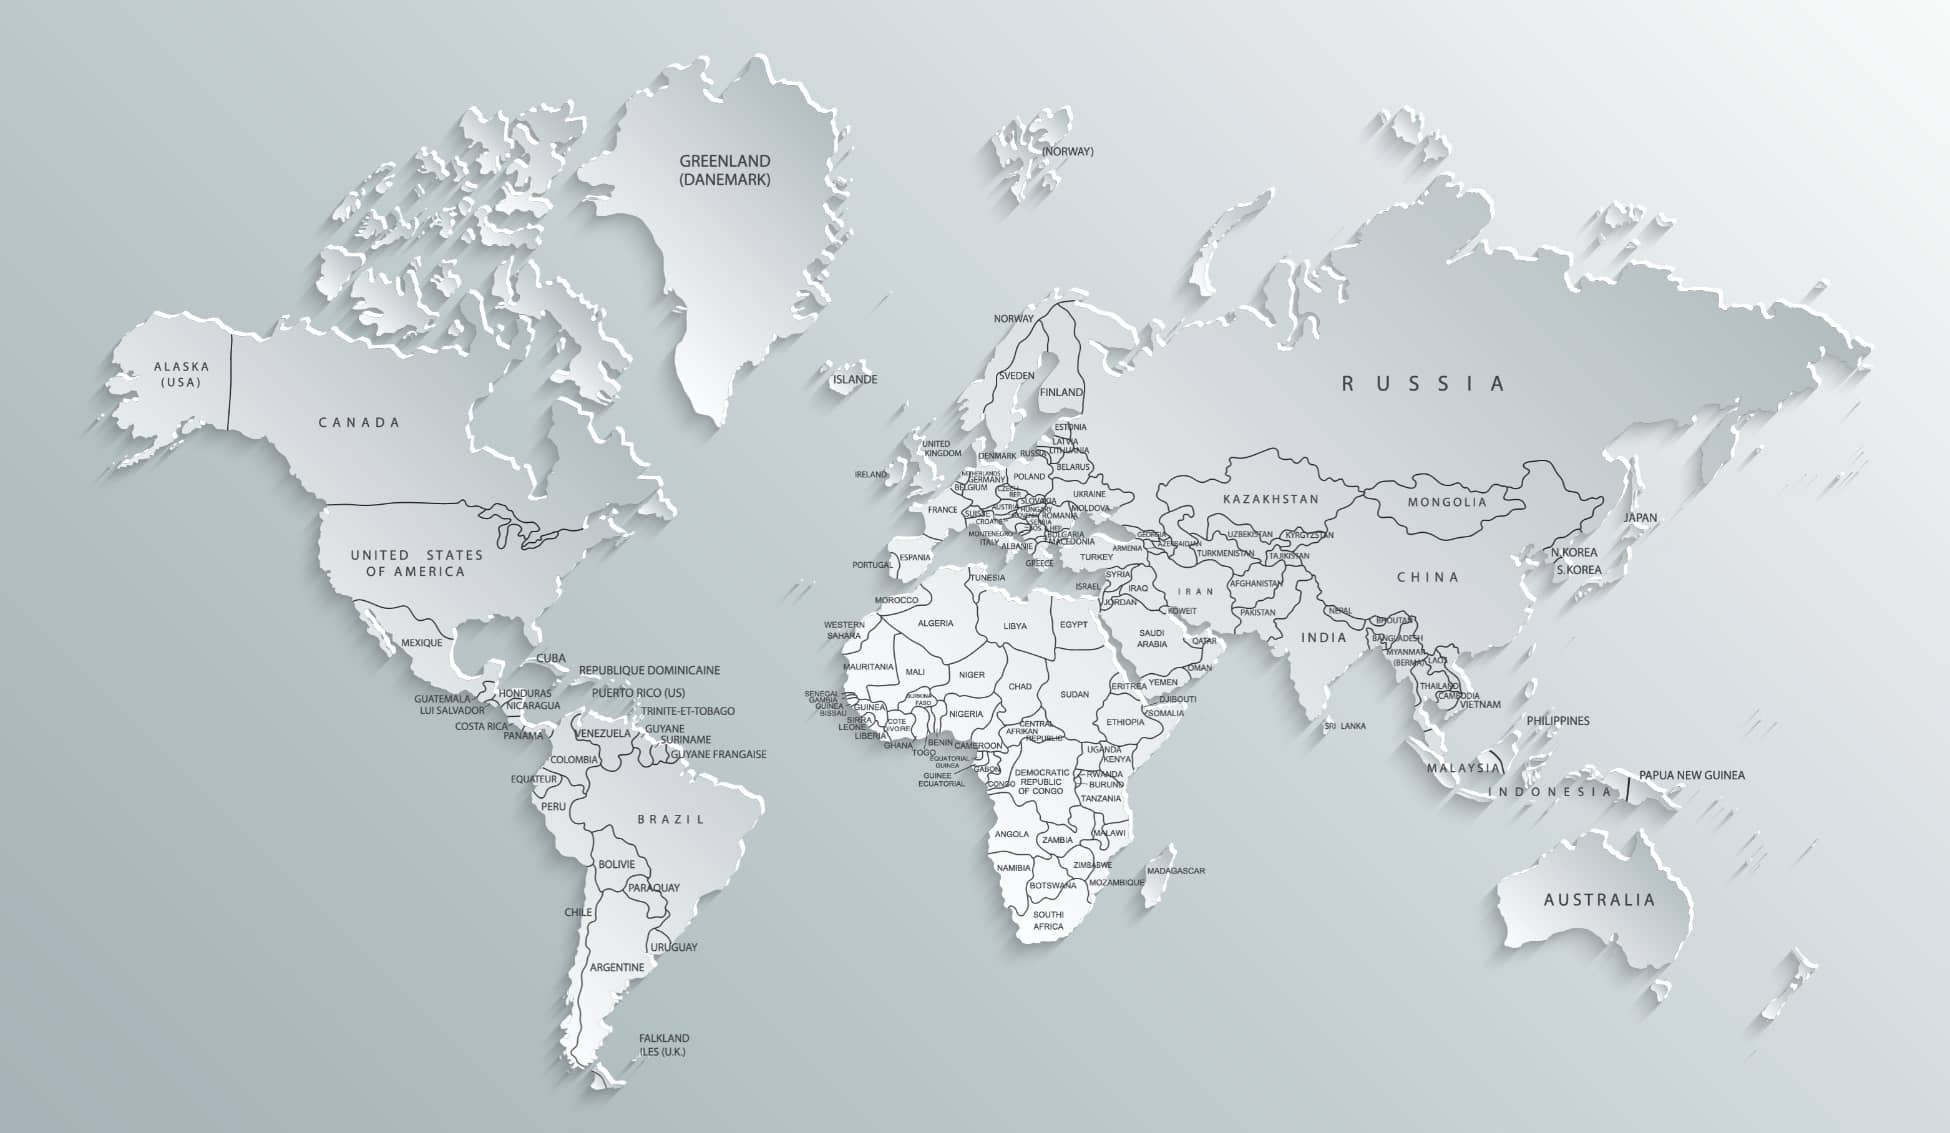 Distribuidores h2o TITANIUM mapa localizaciones